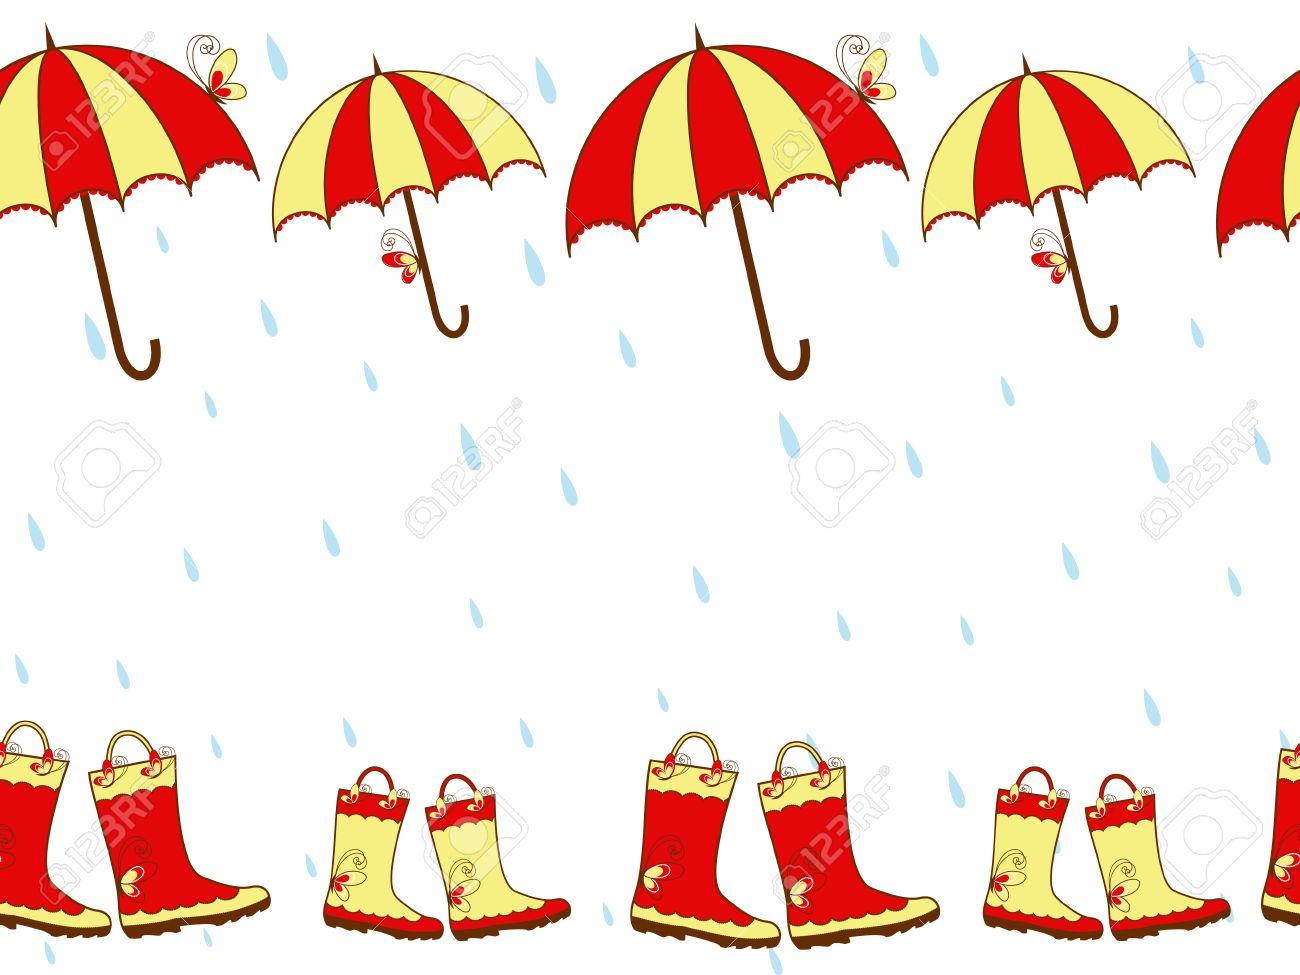 Illustration cute rain boots and umbrella seamless pattern Stock Vector - 8095898